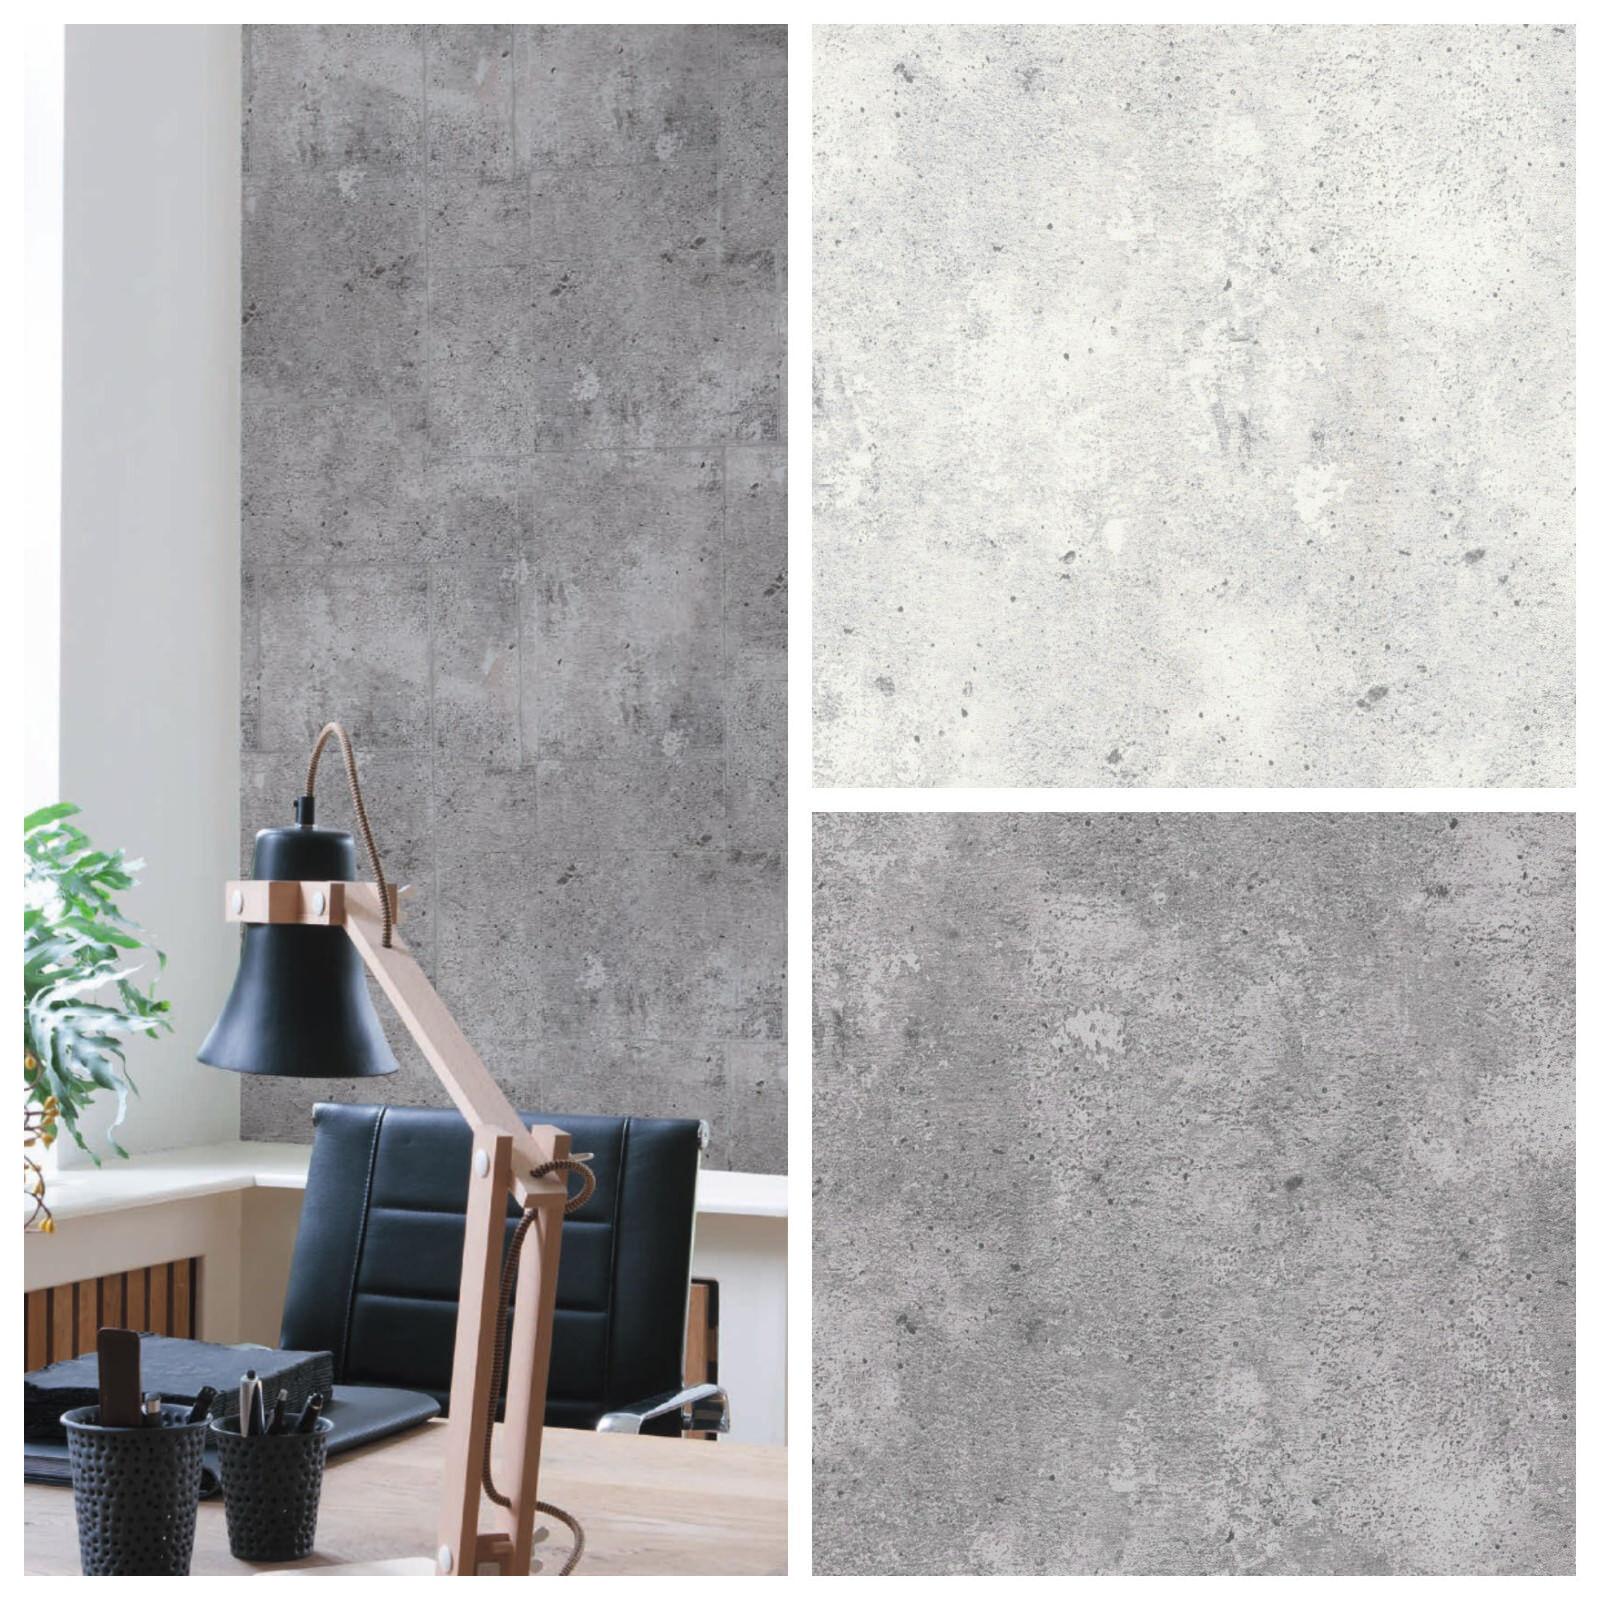 Купить vliestapete beton optik hell grau / grau betontapete на ebay